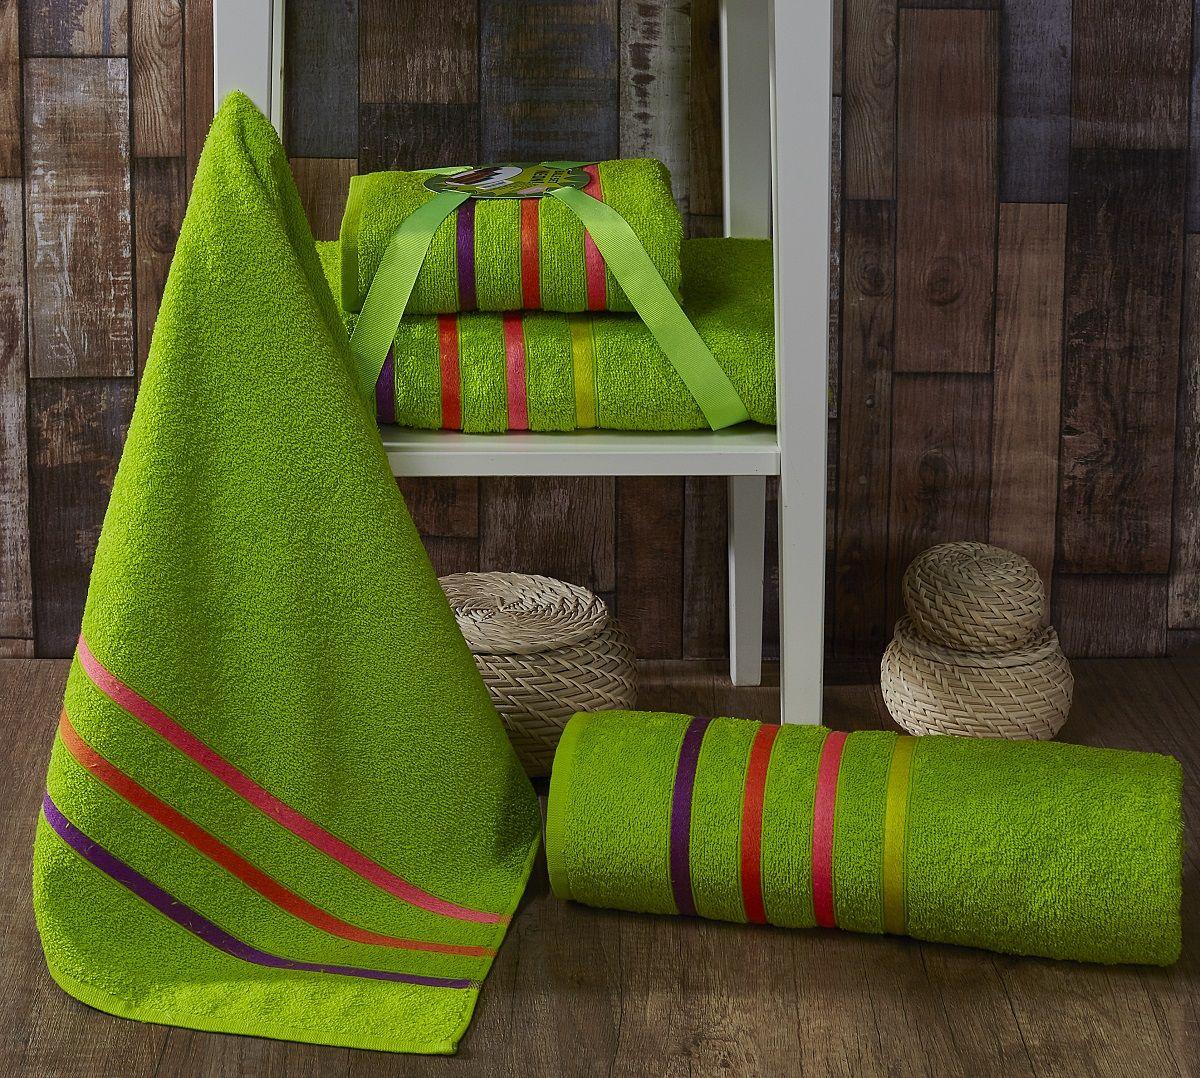 Комплект полотенец Karna Bale Neon, цвет: салатовый, 50 х 80 см, 70 х 140 см, 2 шт